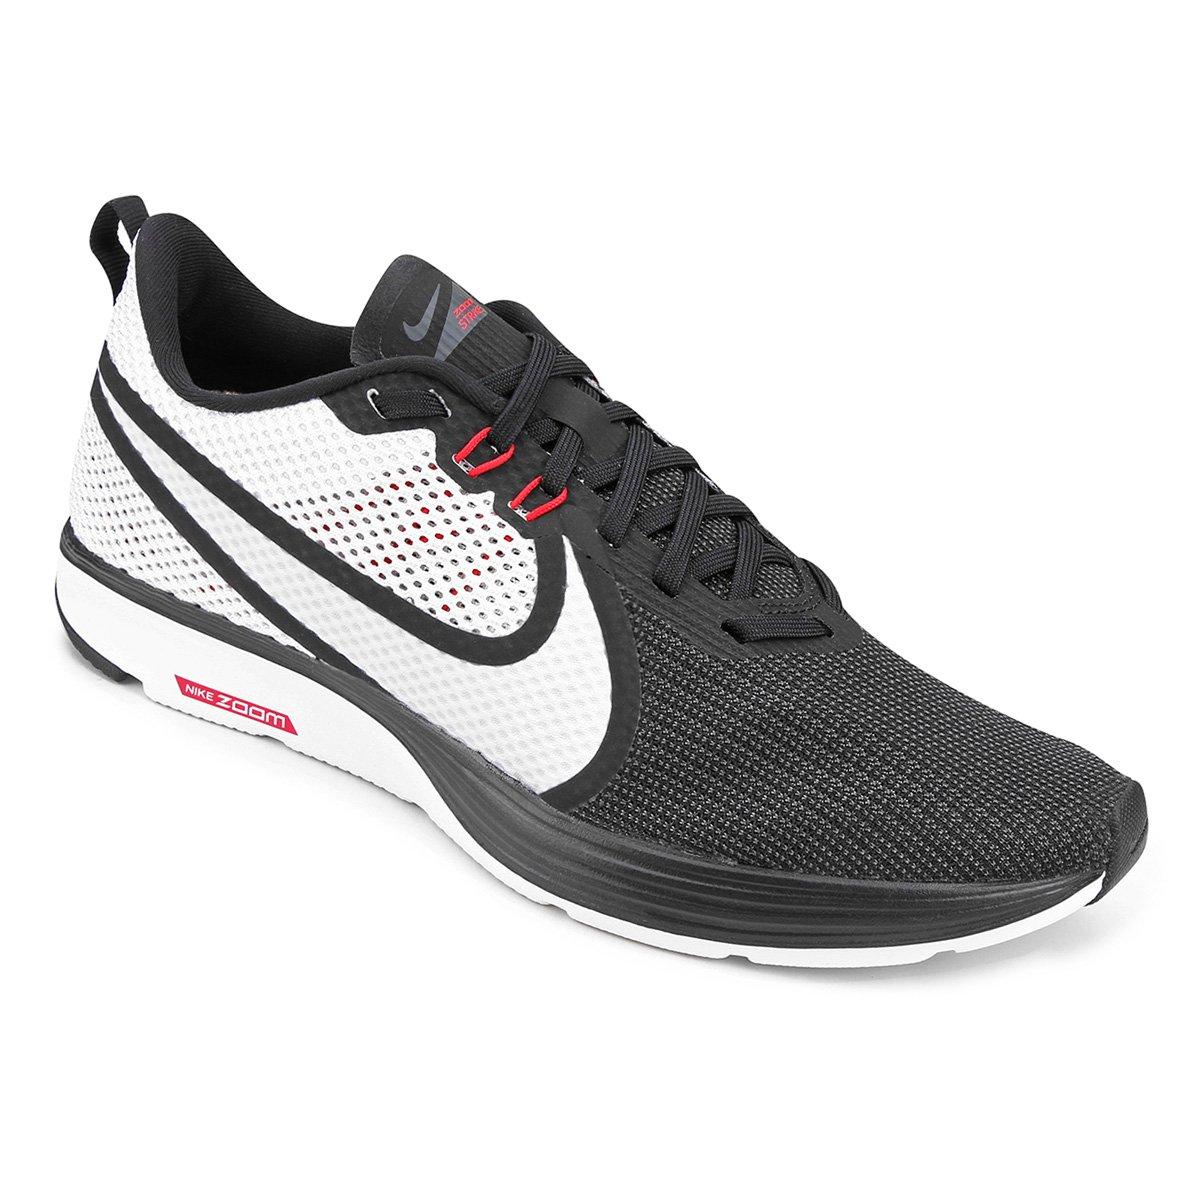 new arrival 15965 7ba93 Tênis Nike Zoom Strike 2 Masculino - Preto e Gelo - Compre Agora   Loja do  Inter